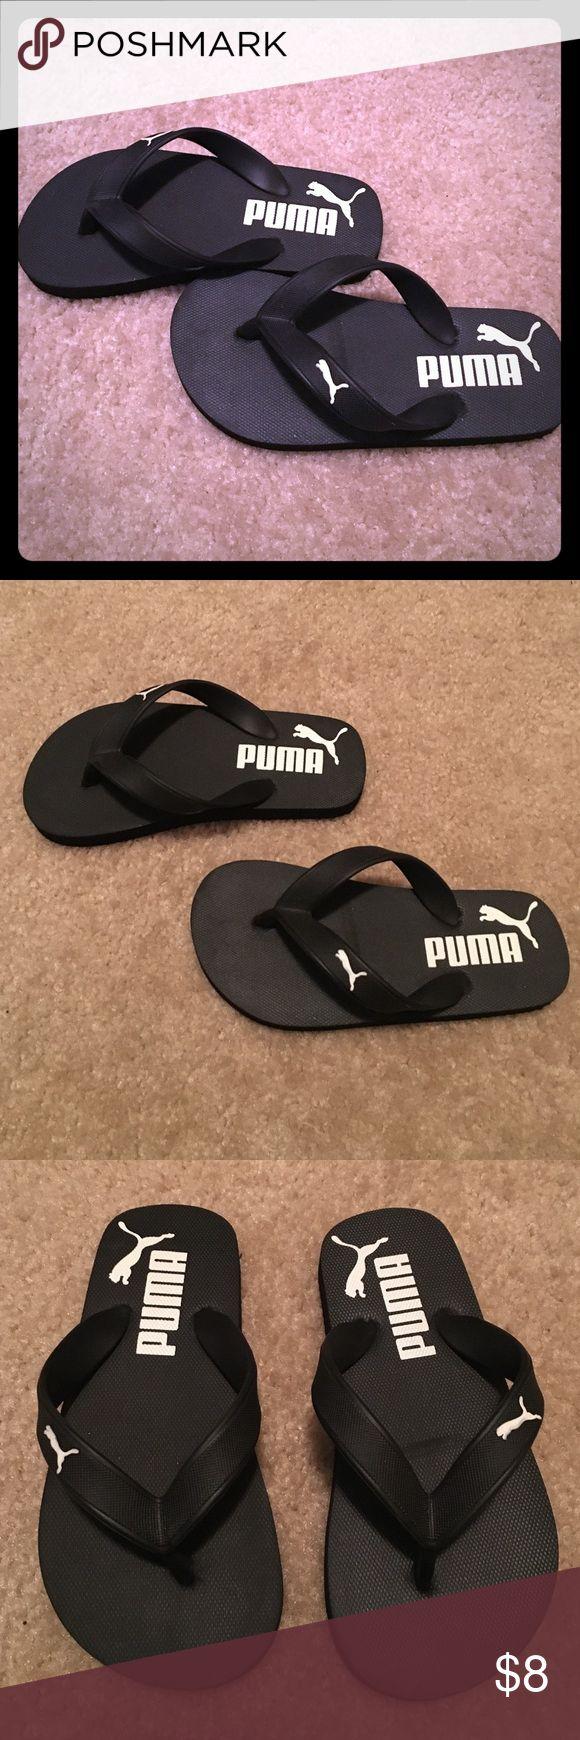 Puma black velcro sandals - Boys Puma Sandals Size 11 12